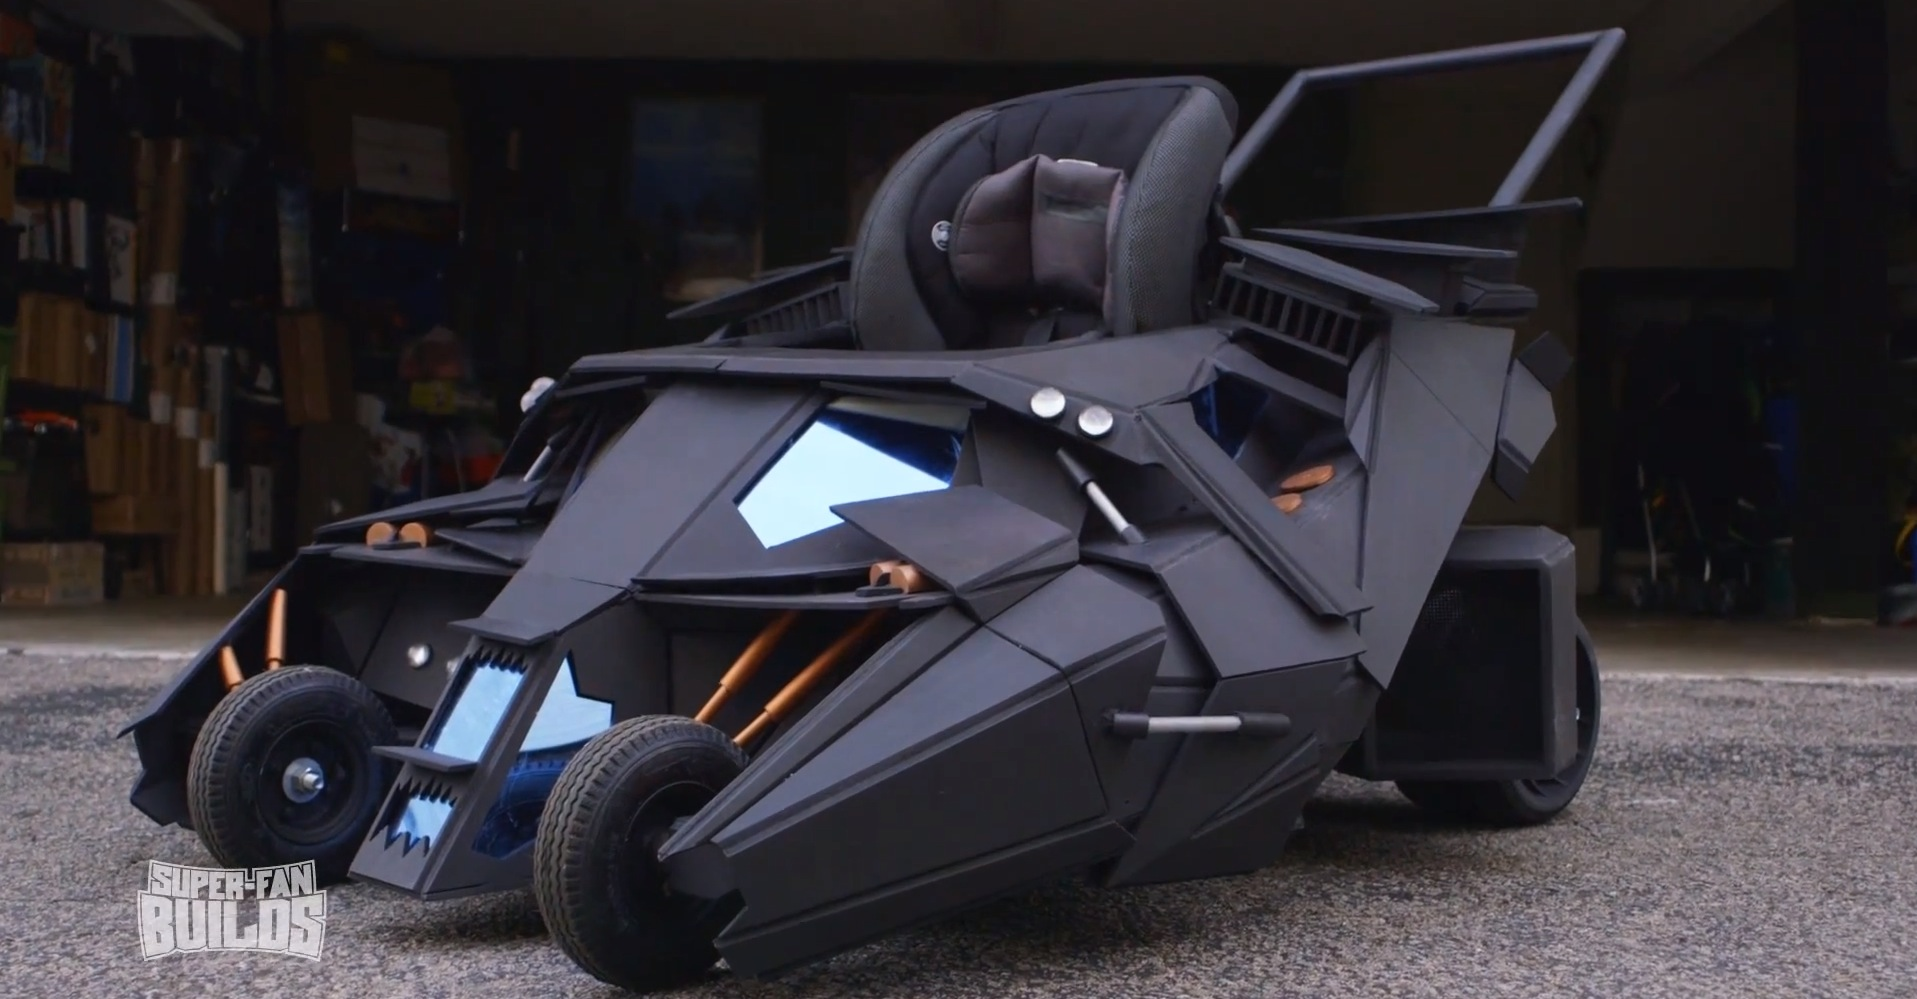 Batman S Tumbler Batmobile Turned Into Baby Stroller